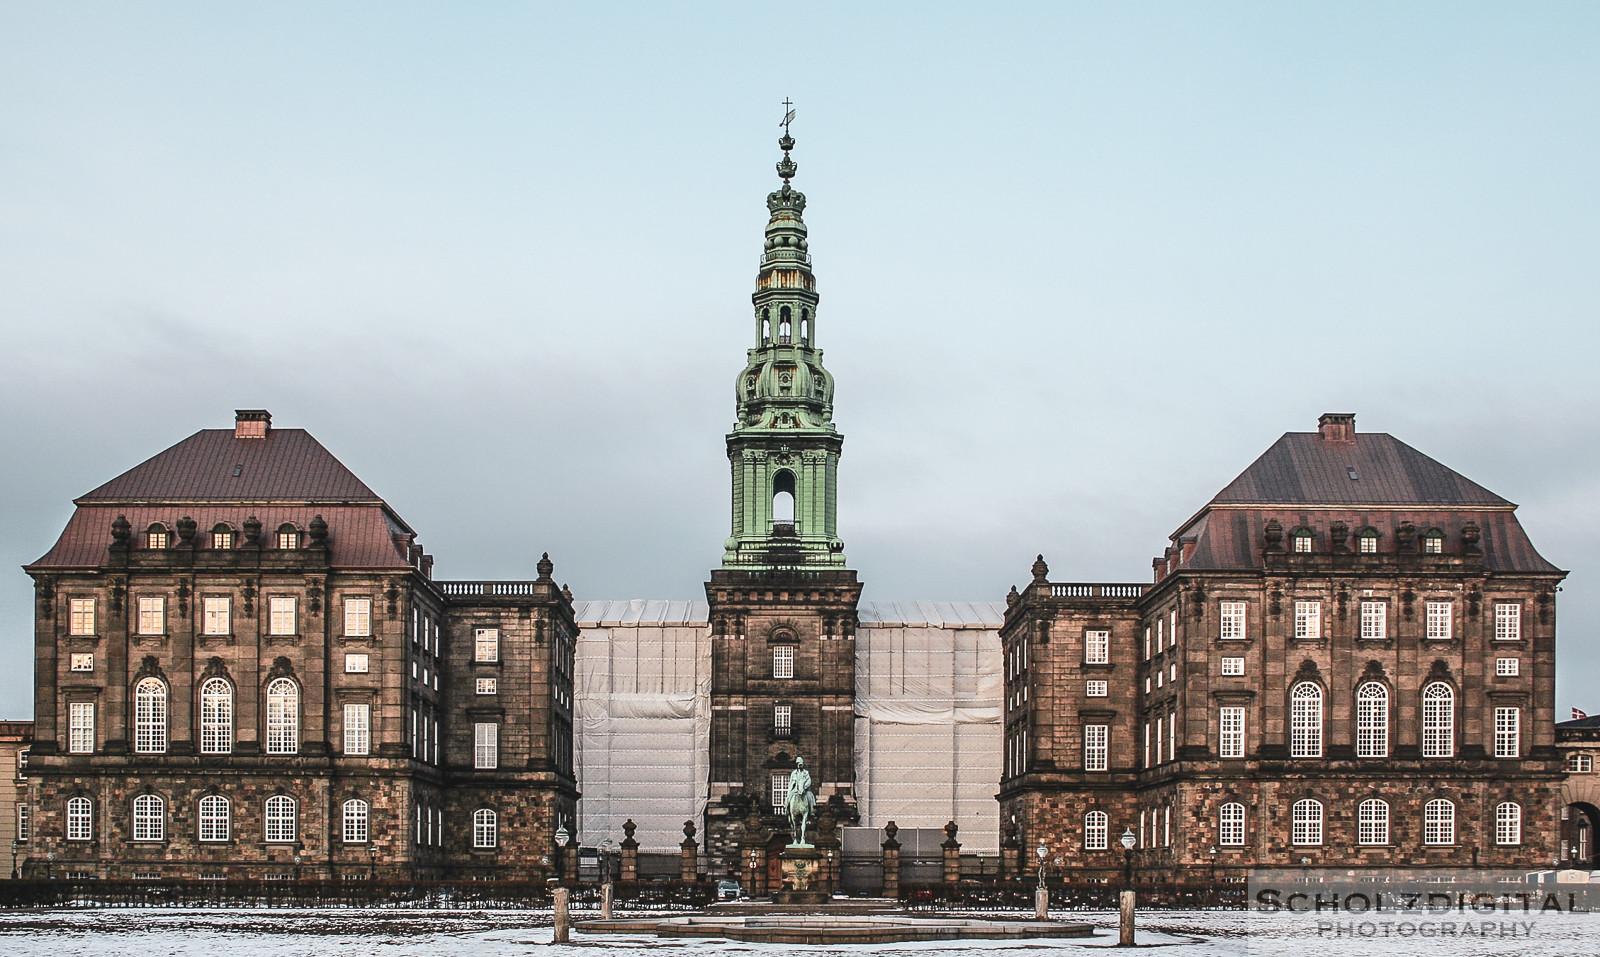 Schloss Christiansborg, Kopenhagen, Dänemark, Fotografie, Städtereisen, Sightseeing, Scholzdigital